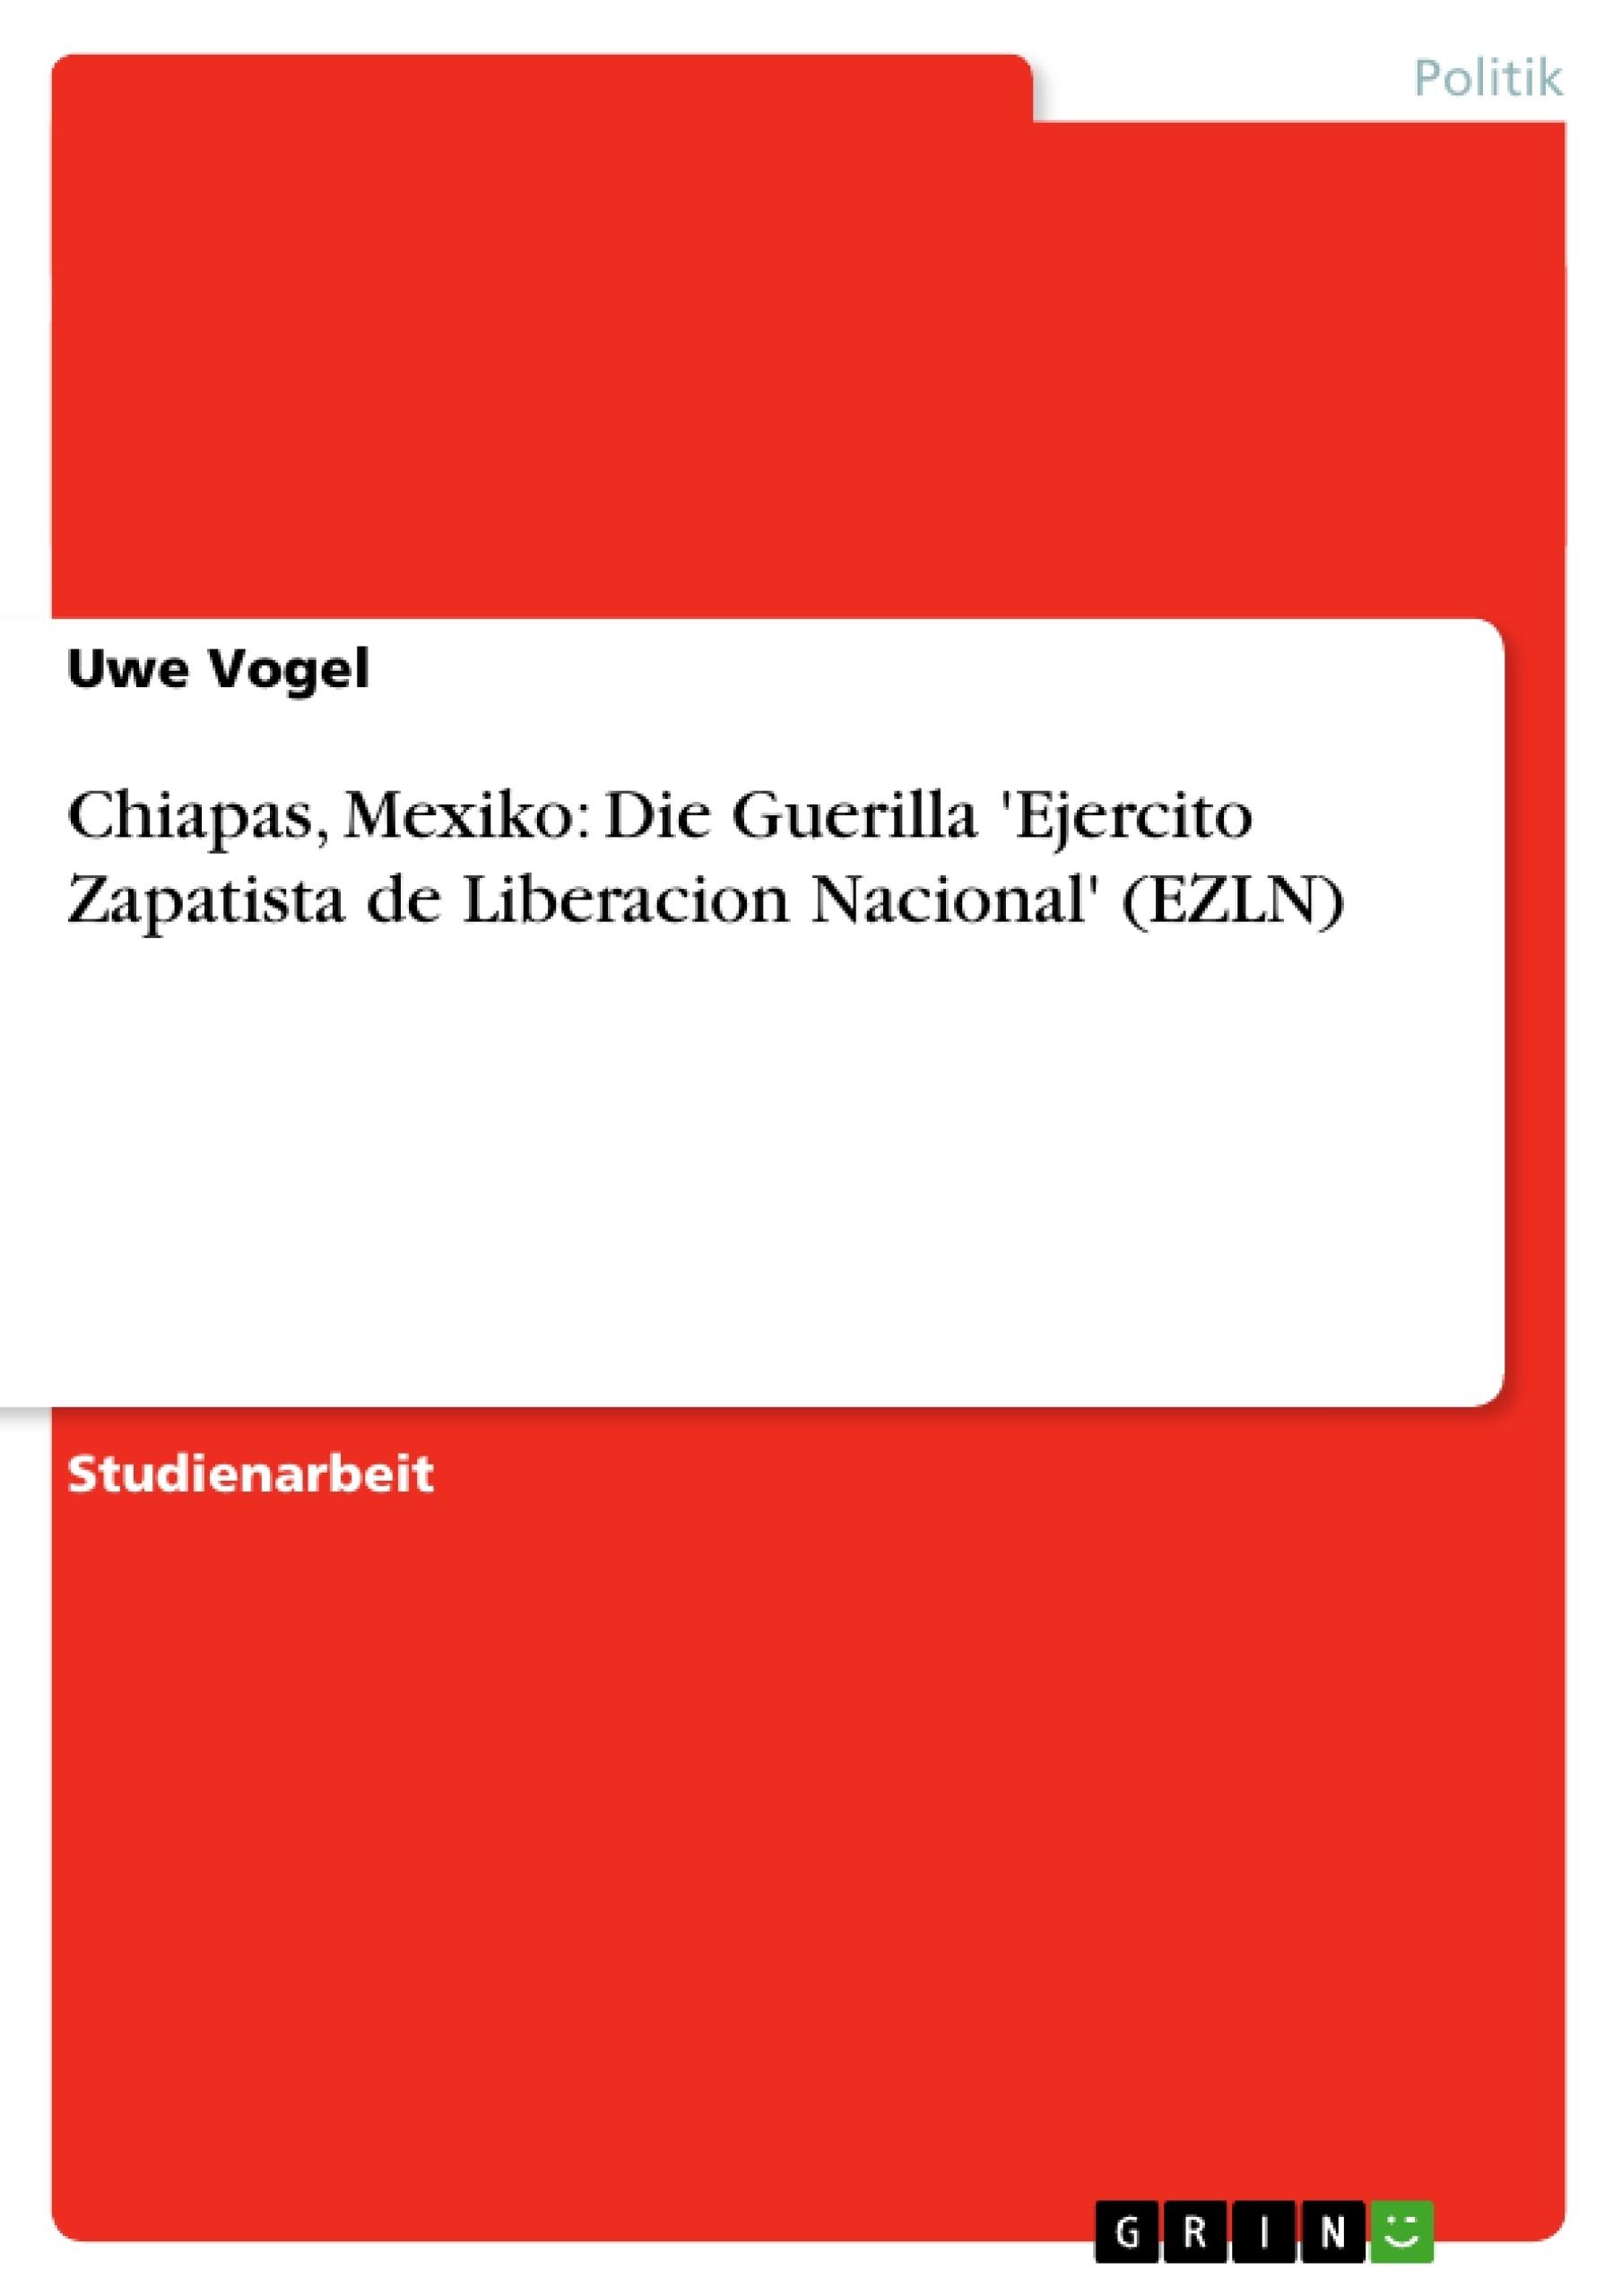 Titel: Chiapas, Mexiko: Die Guerilla 'Ejercito Zapatista de Liberacion Nacional'  (EZLN)